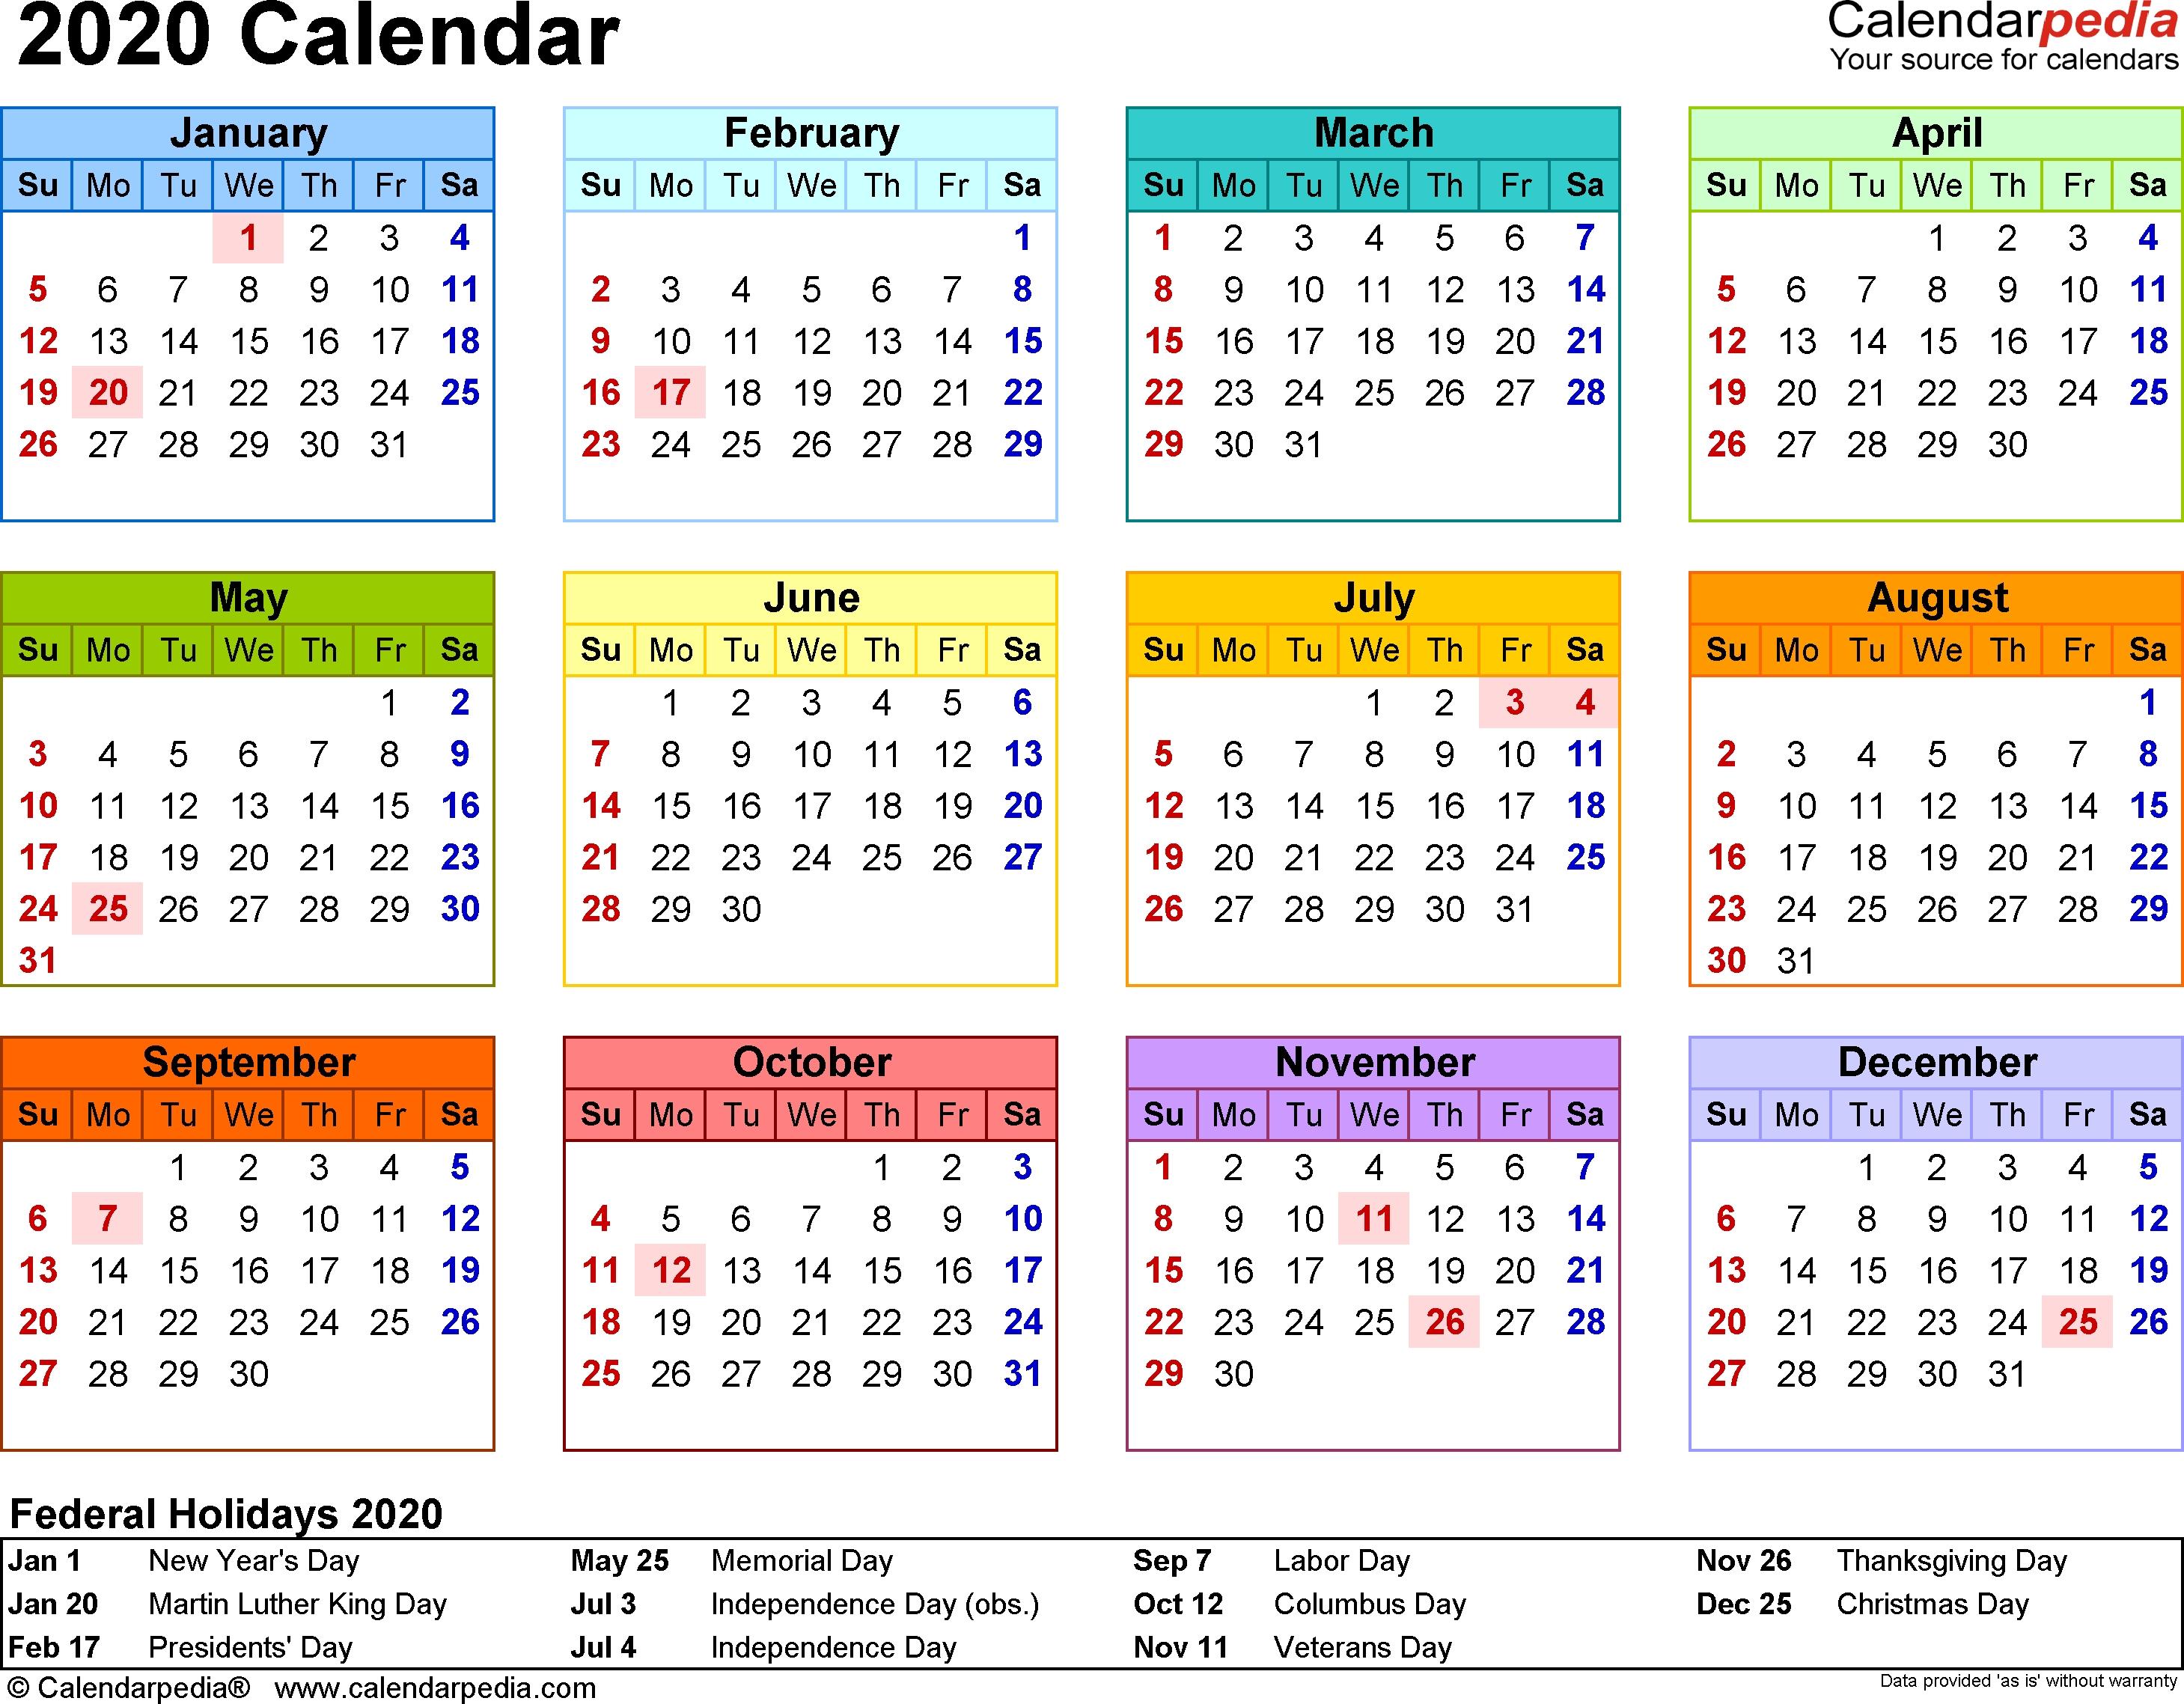 2020 Calendar Pdf - 17 Free Printable Calendar Templates pertaining to Printable 2020 Calendar